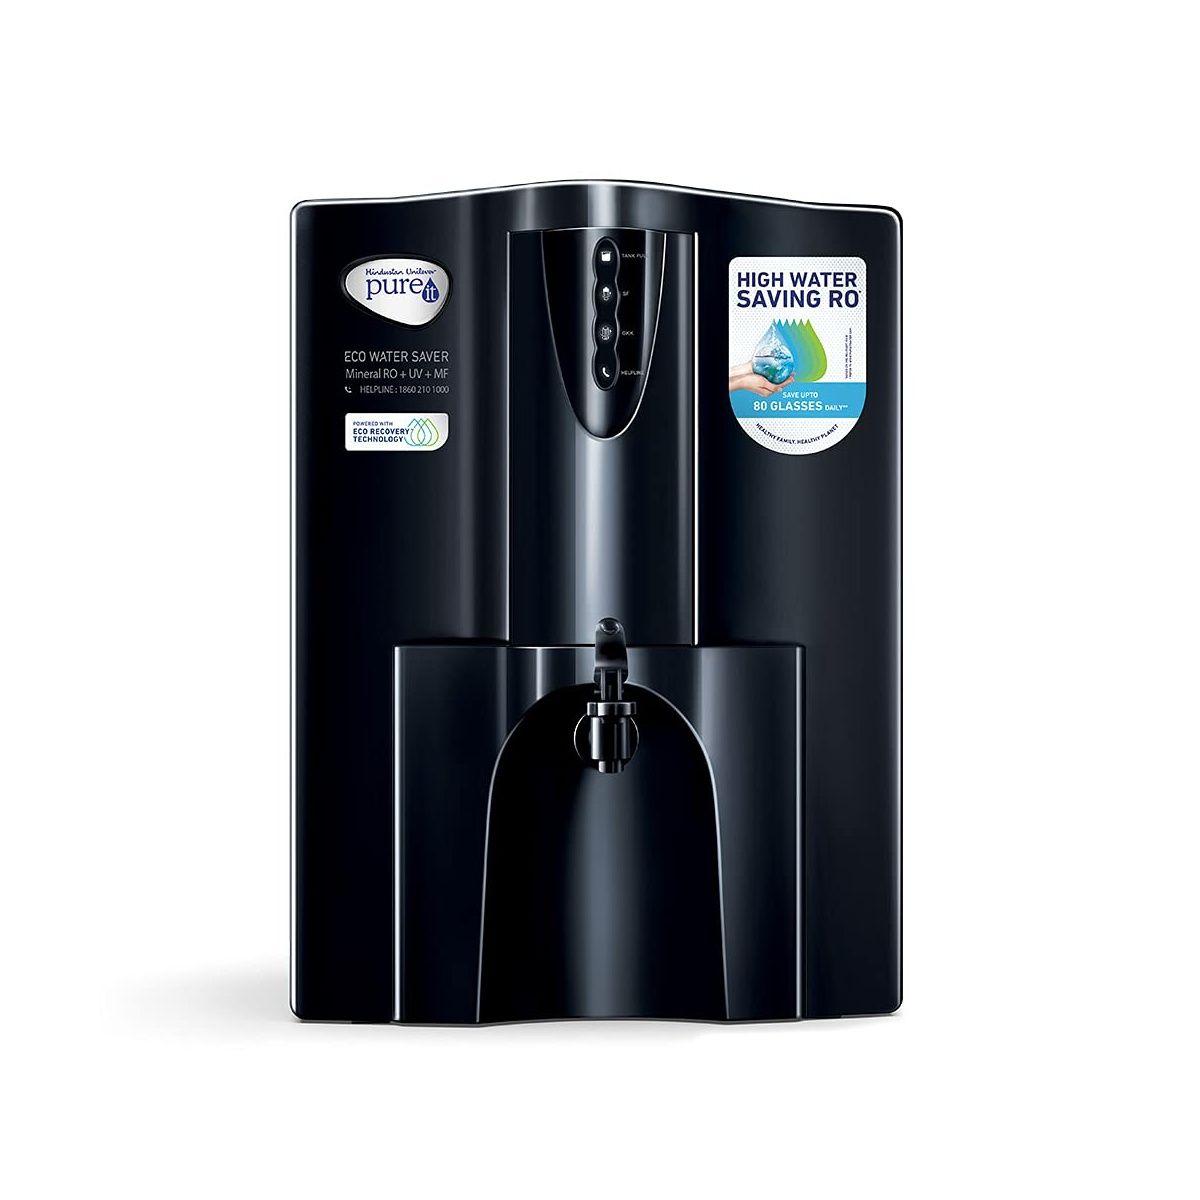 HUL Pureit Eco Water Purifier